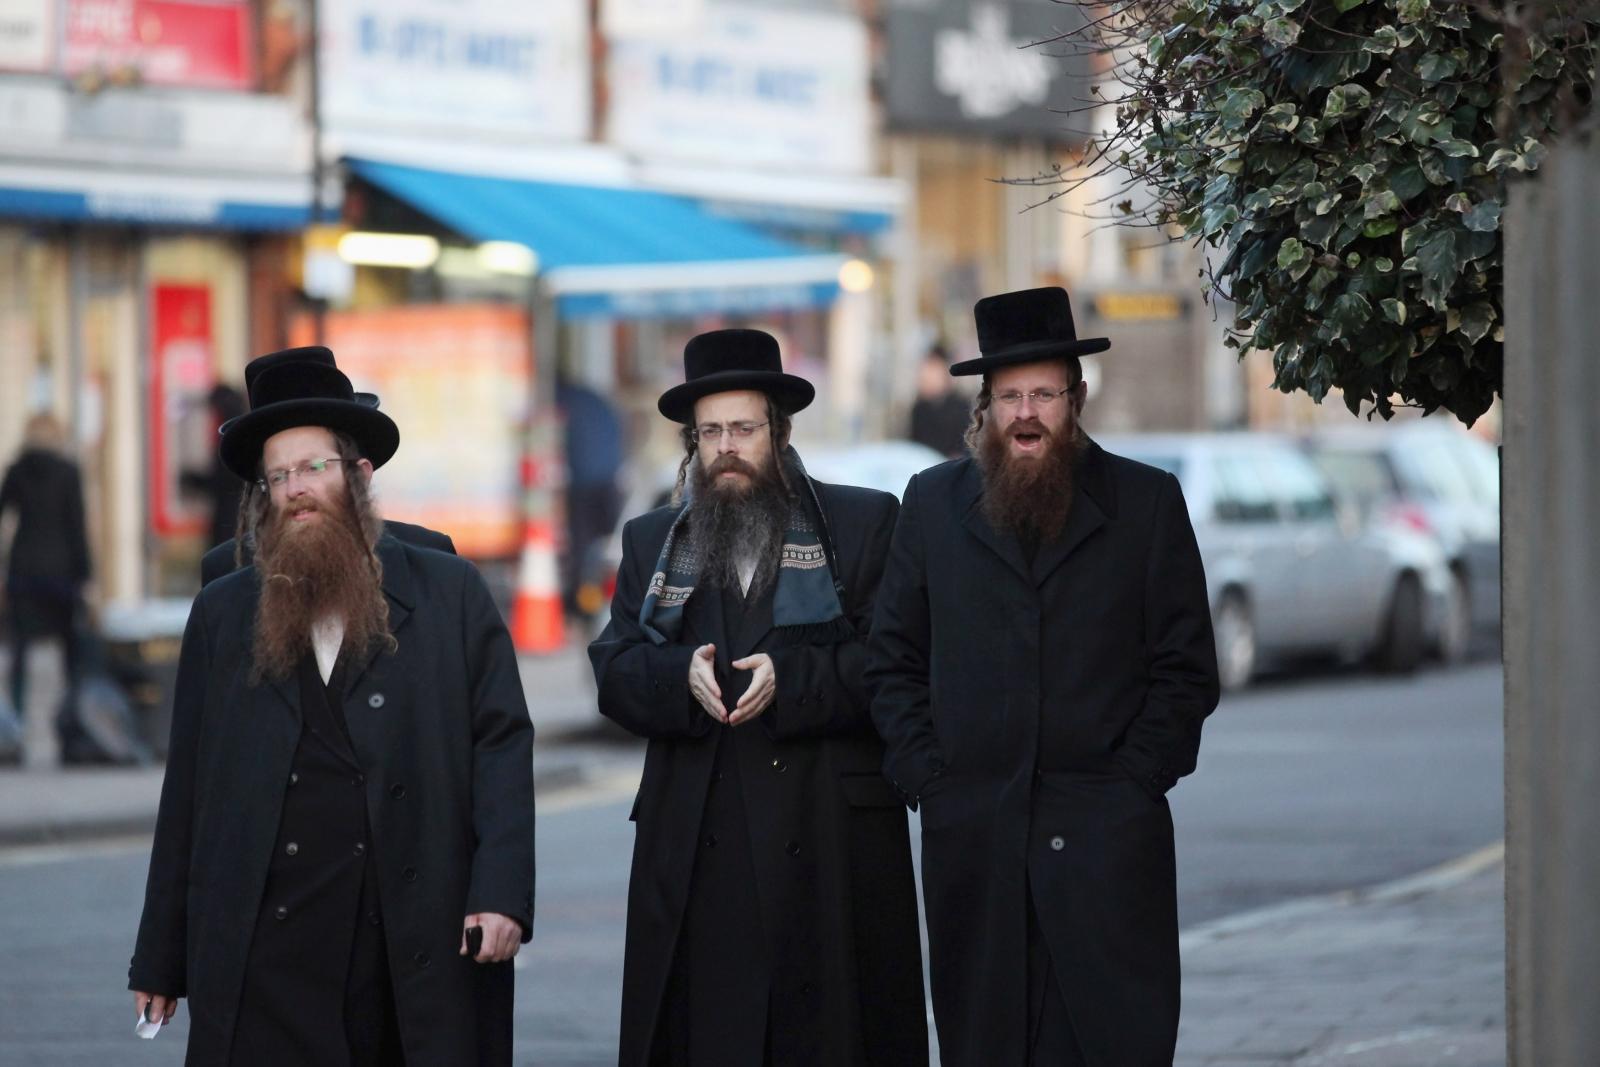 British Jewish people ...